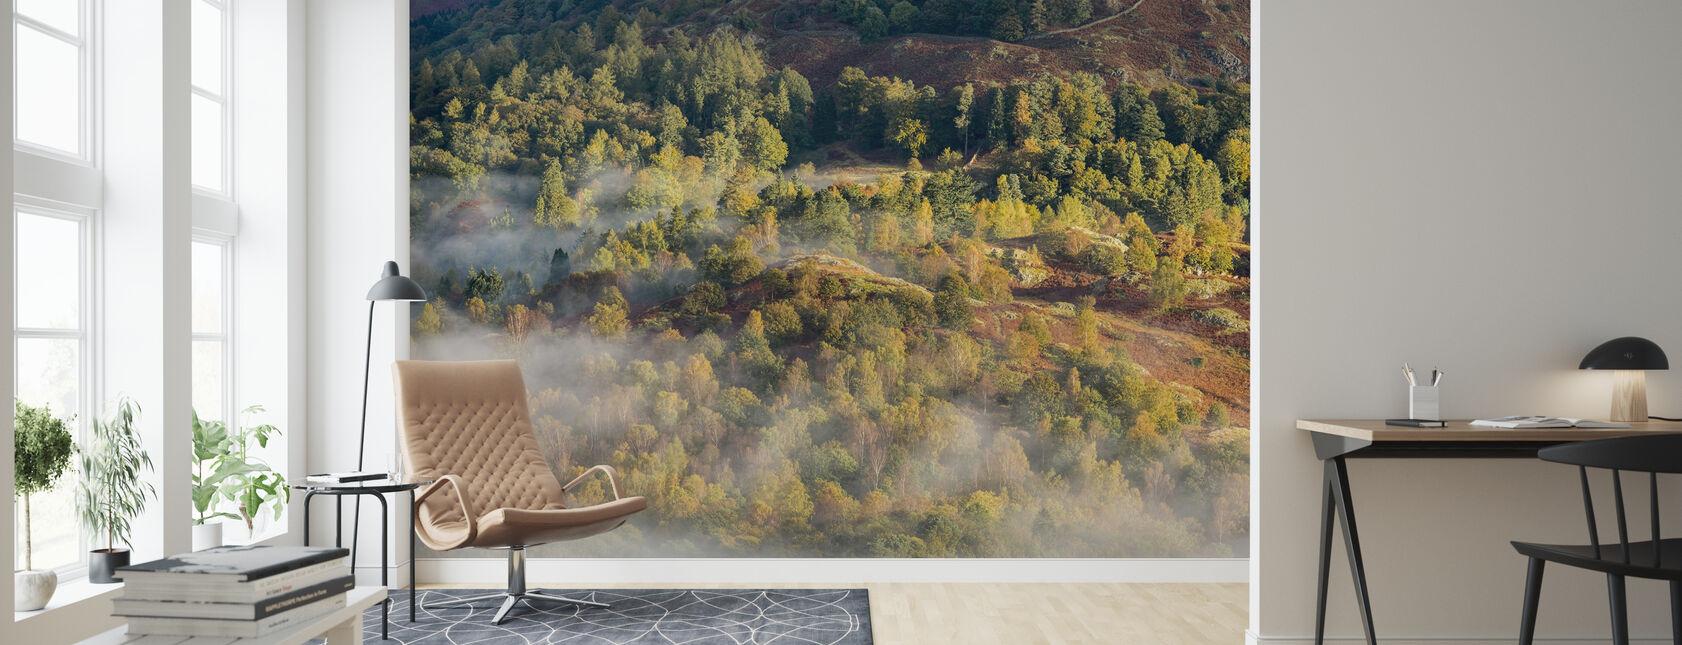 Lake District - Wallpaper - Living Room